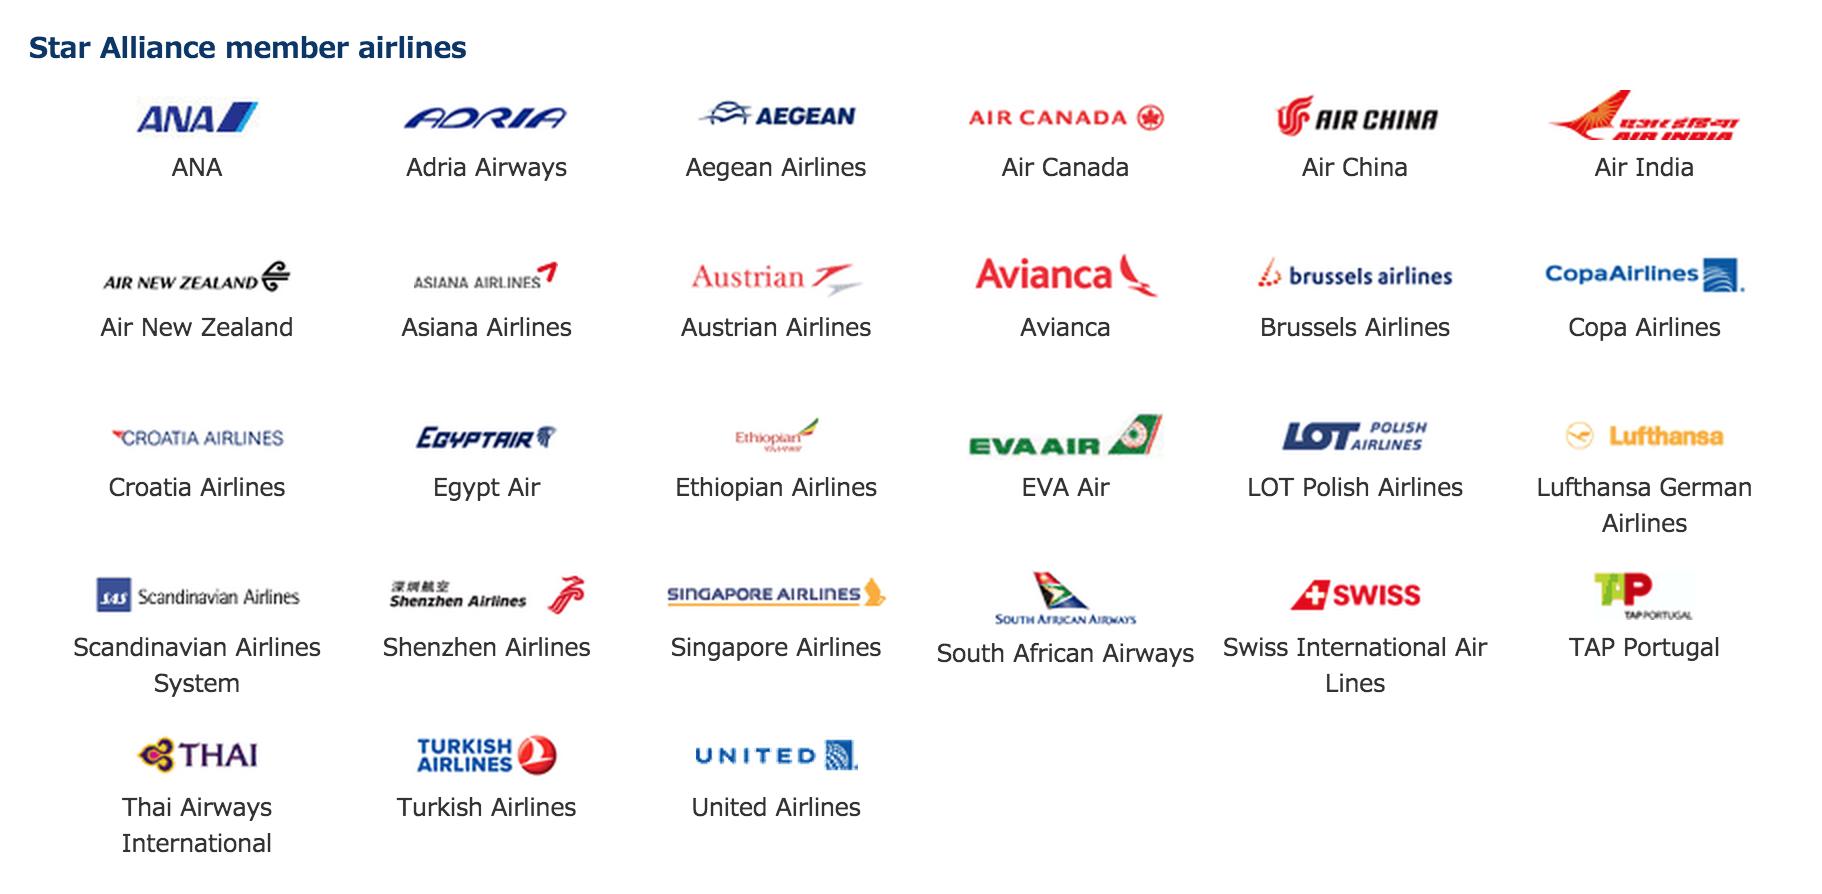 Líneas Aéreas que pertenecen a Star Alliance